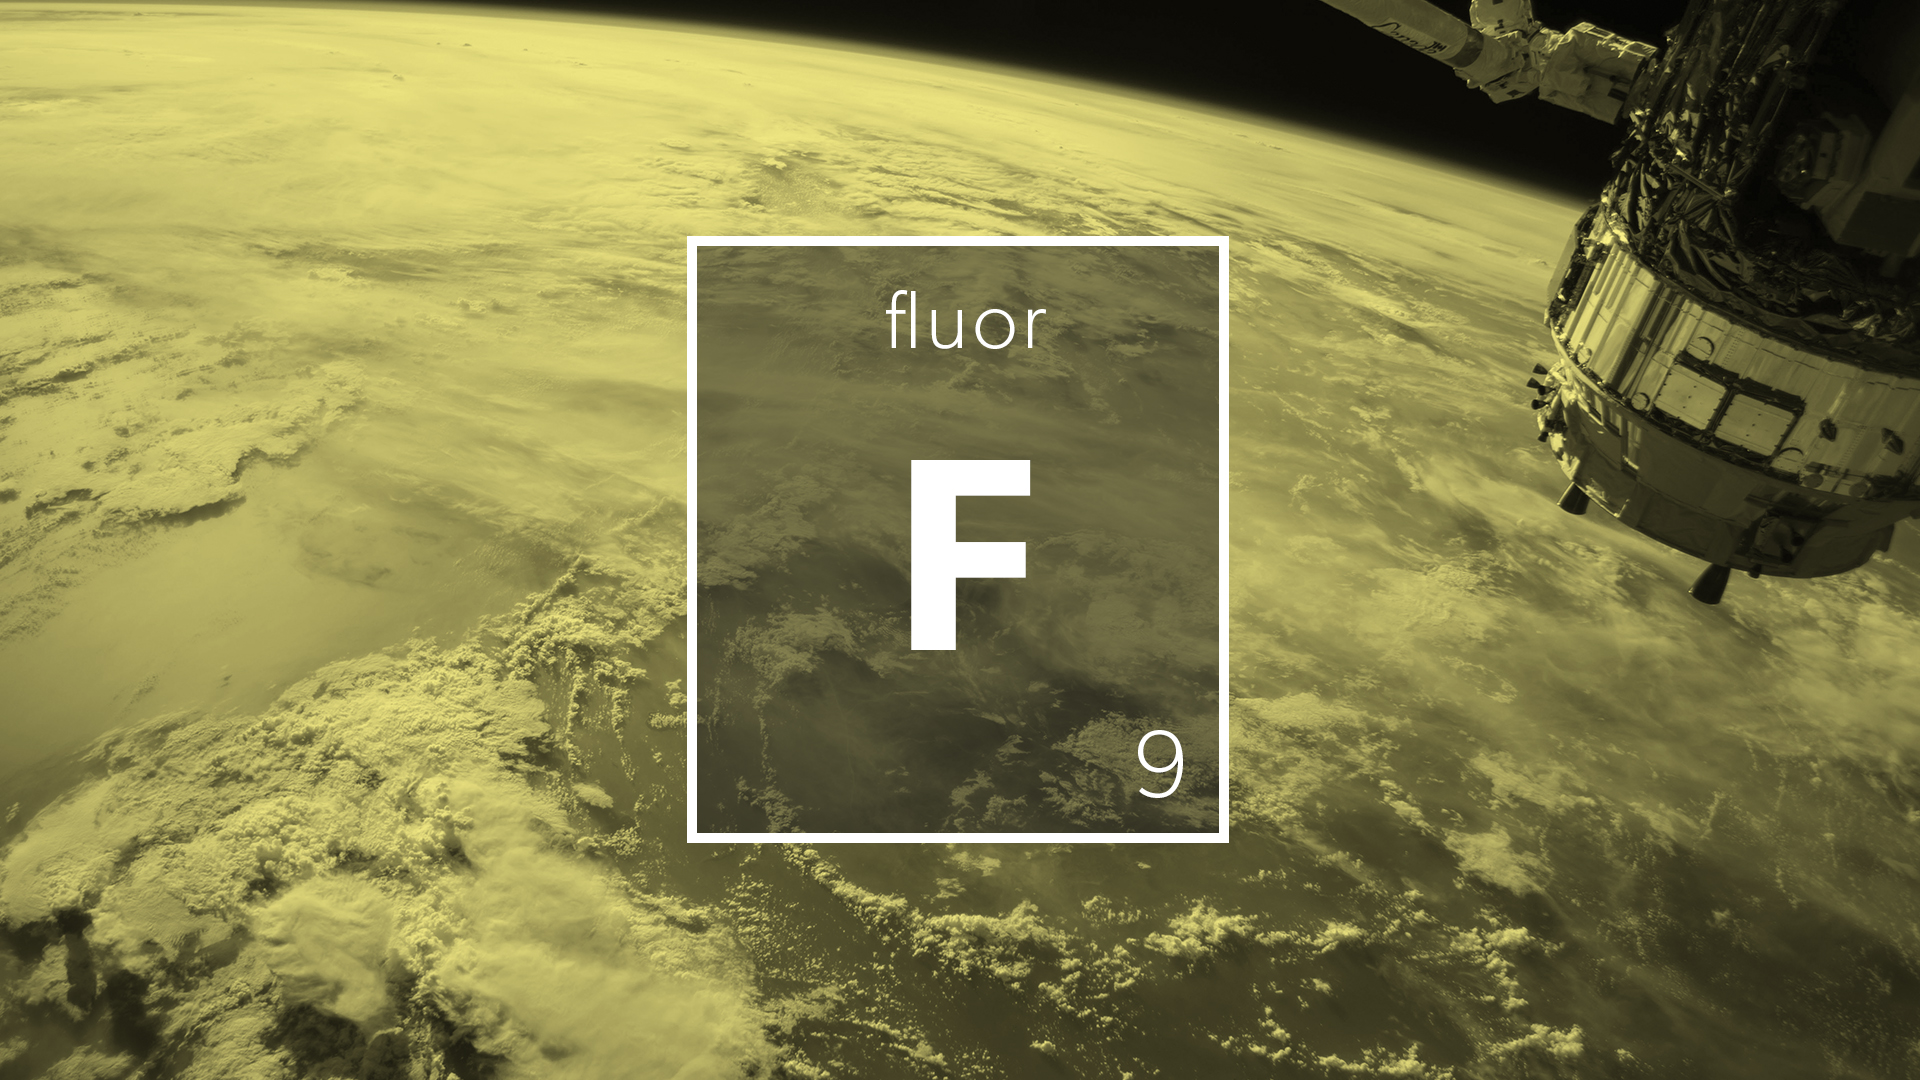 fluor_thumb_desktop_2.jpg